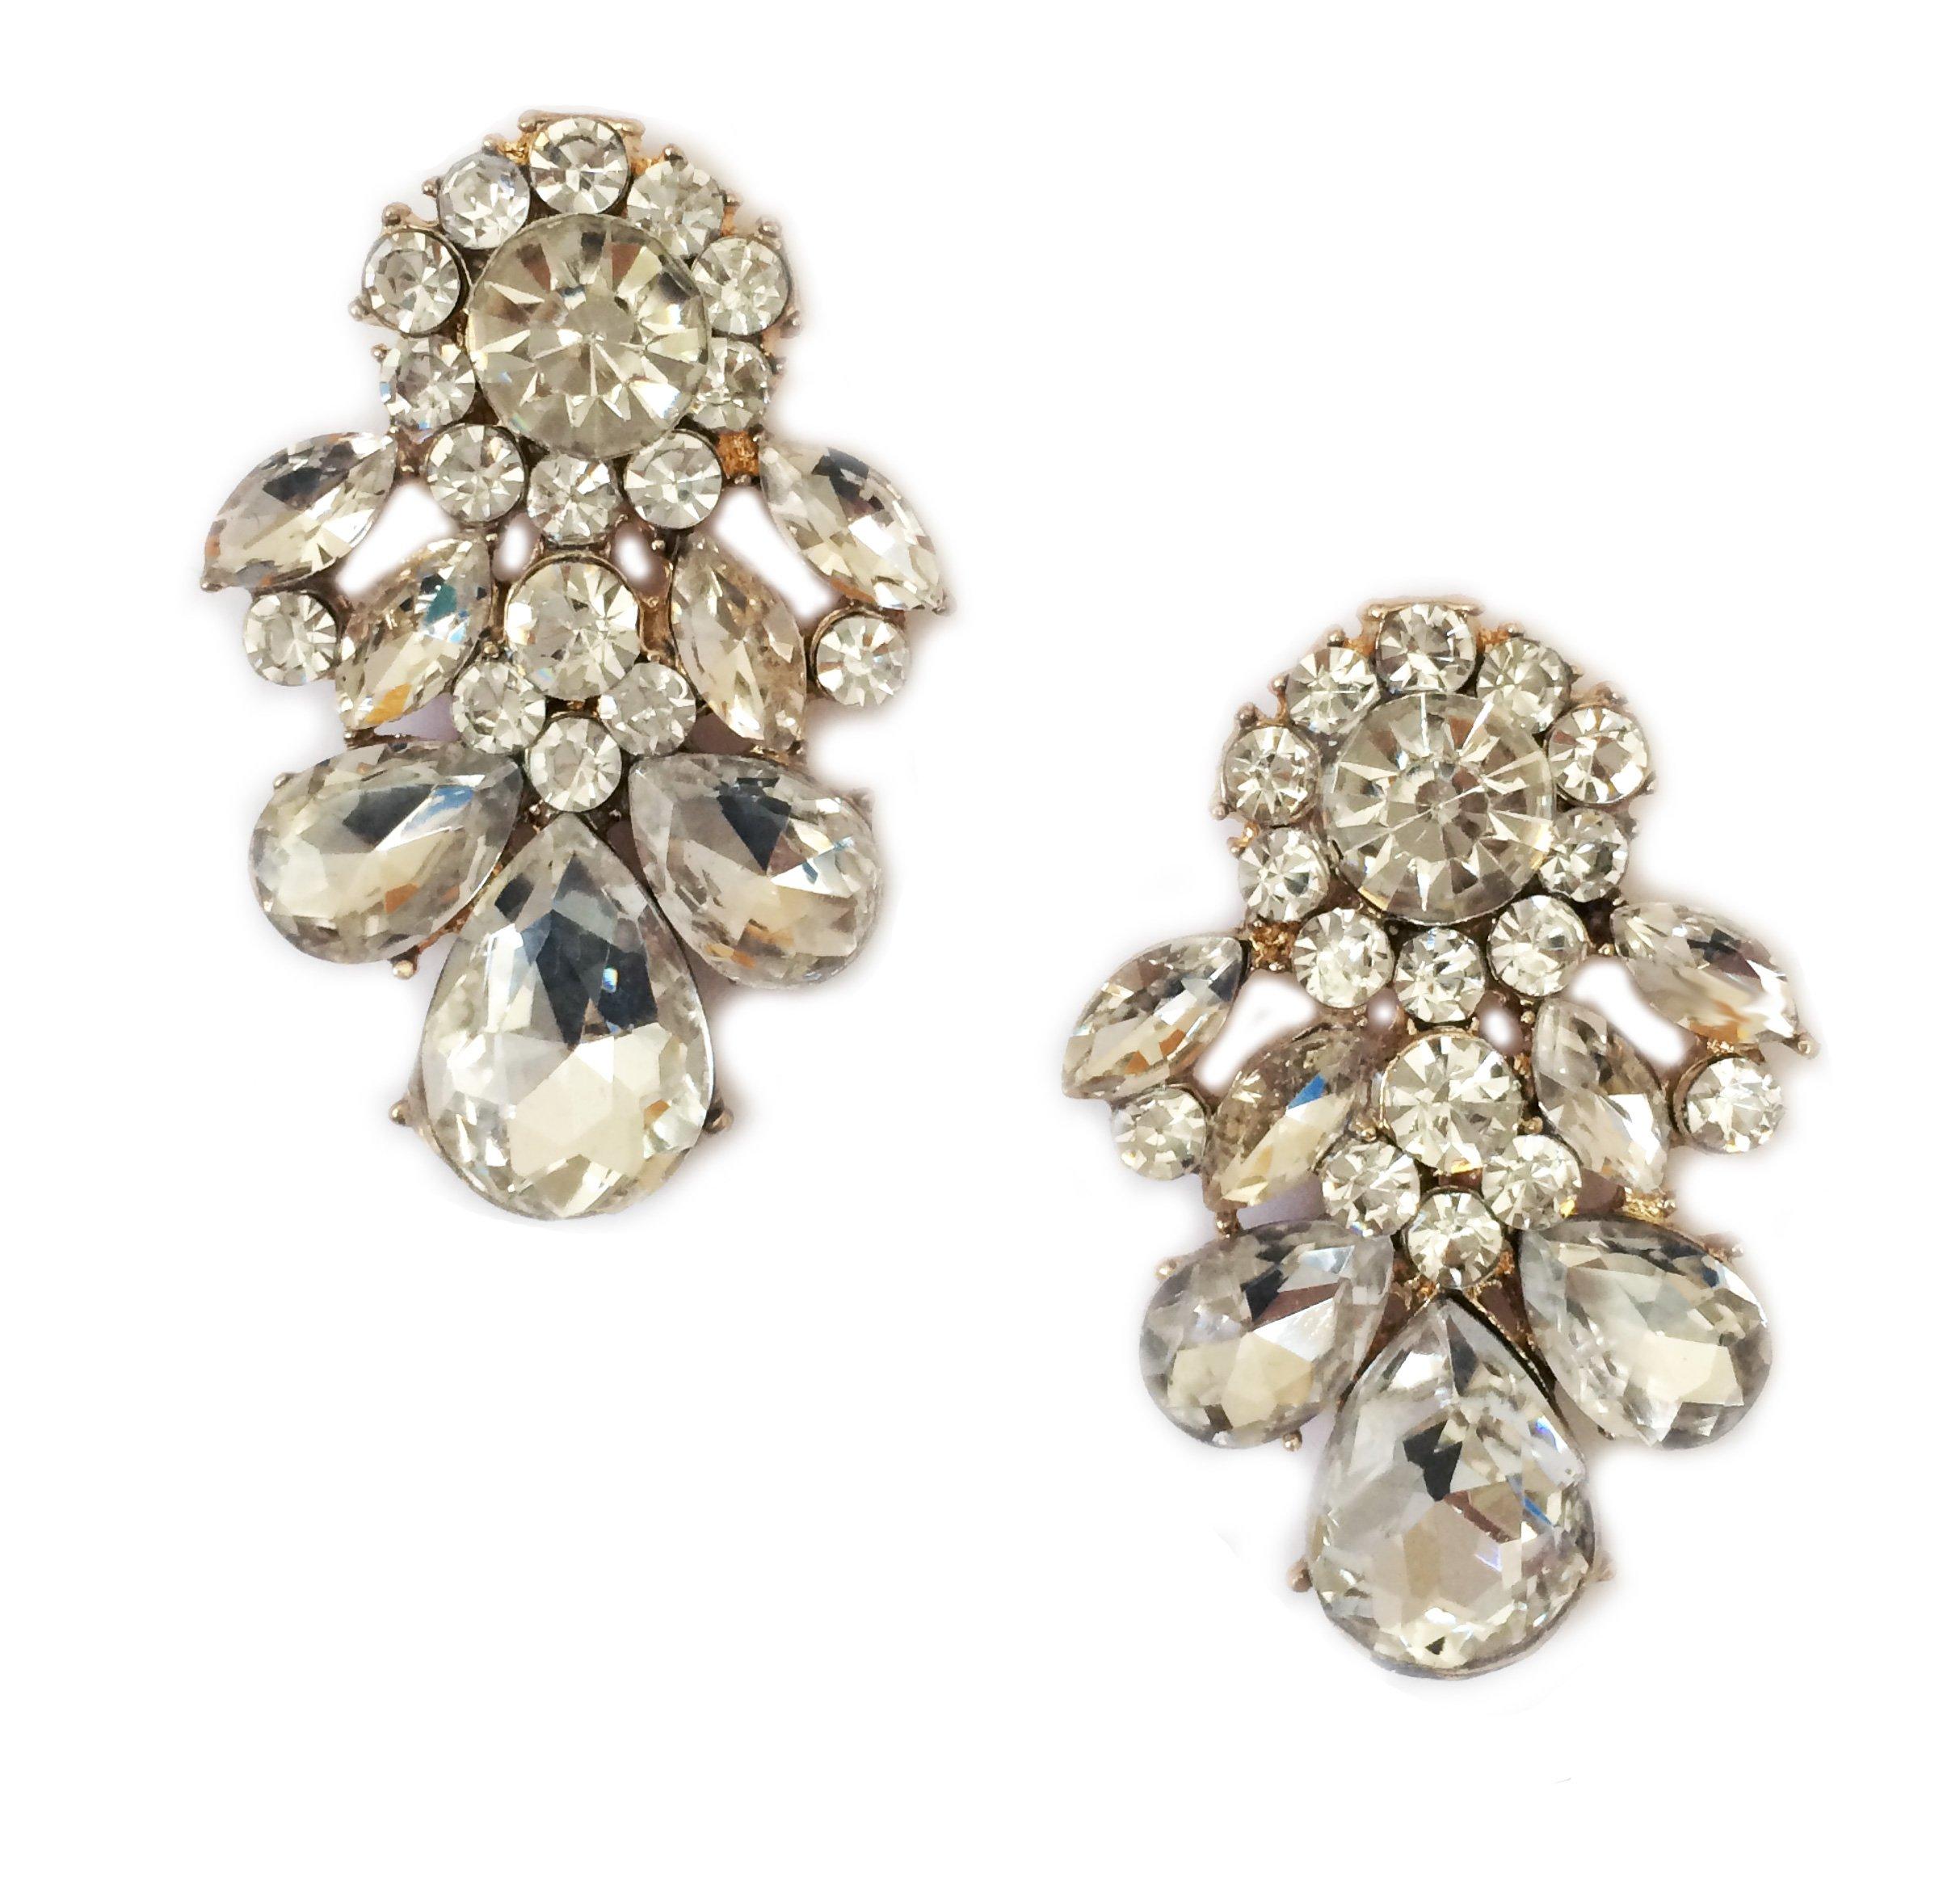 Gold Tone Art Deco Antique Vintage Style Rhinestone Crystal Wedding Bridal Prom Earrings